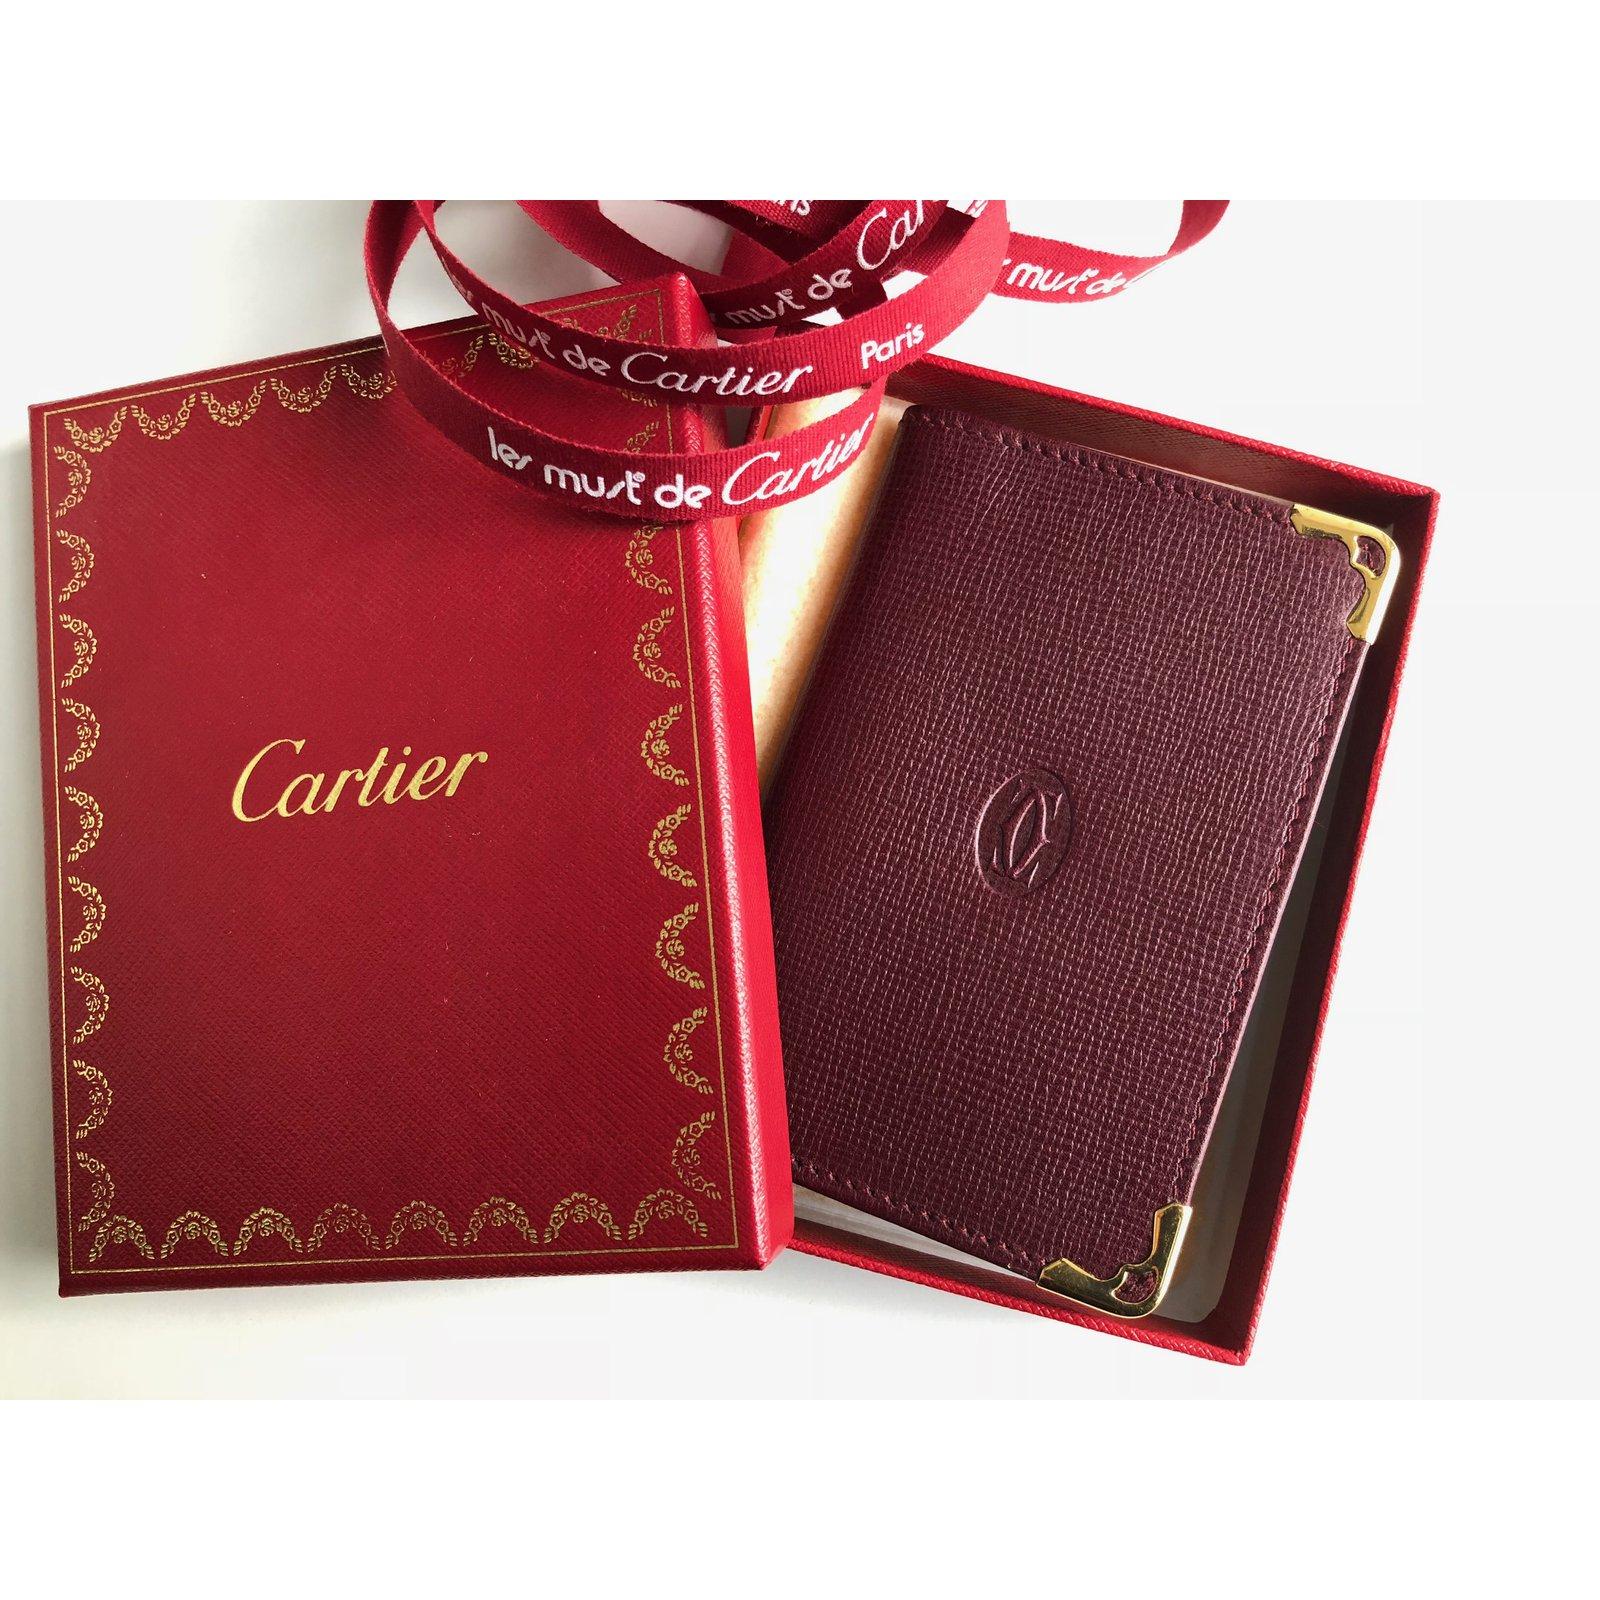 Cartier Cartier Visitenkartenhalter Geldbörsen Geldtaschen